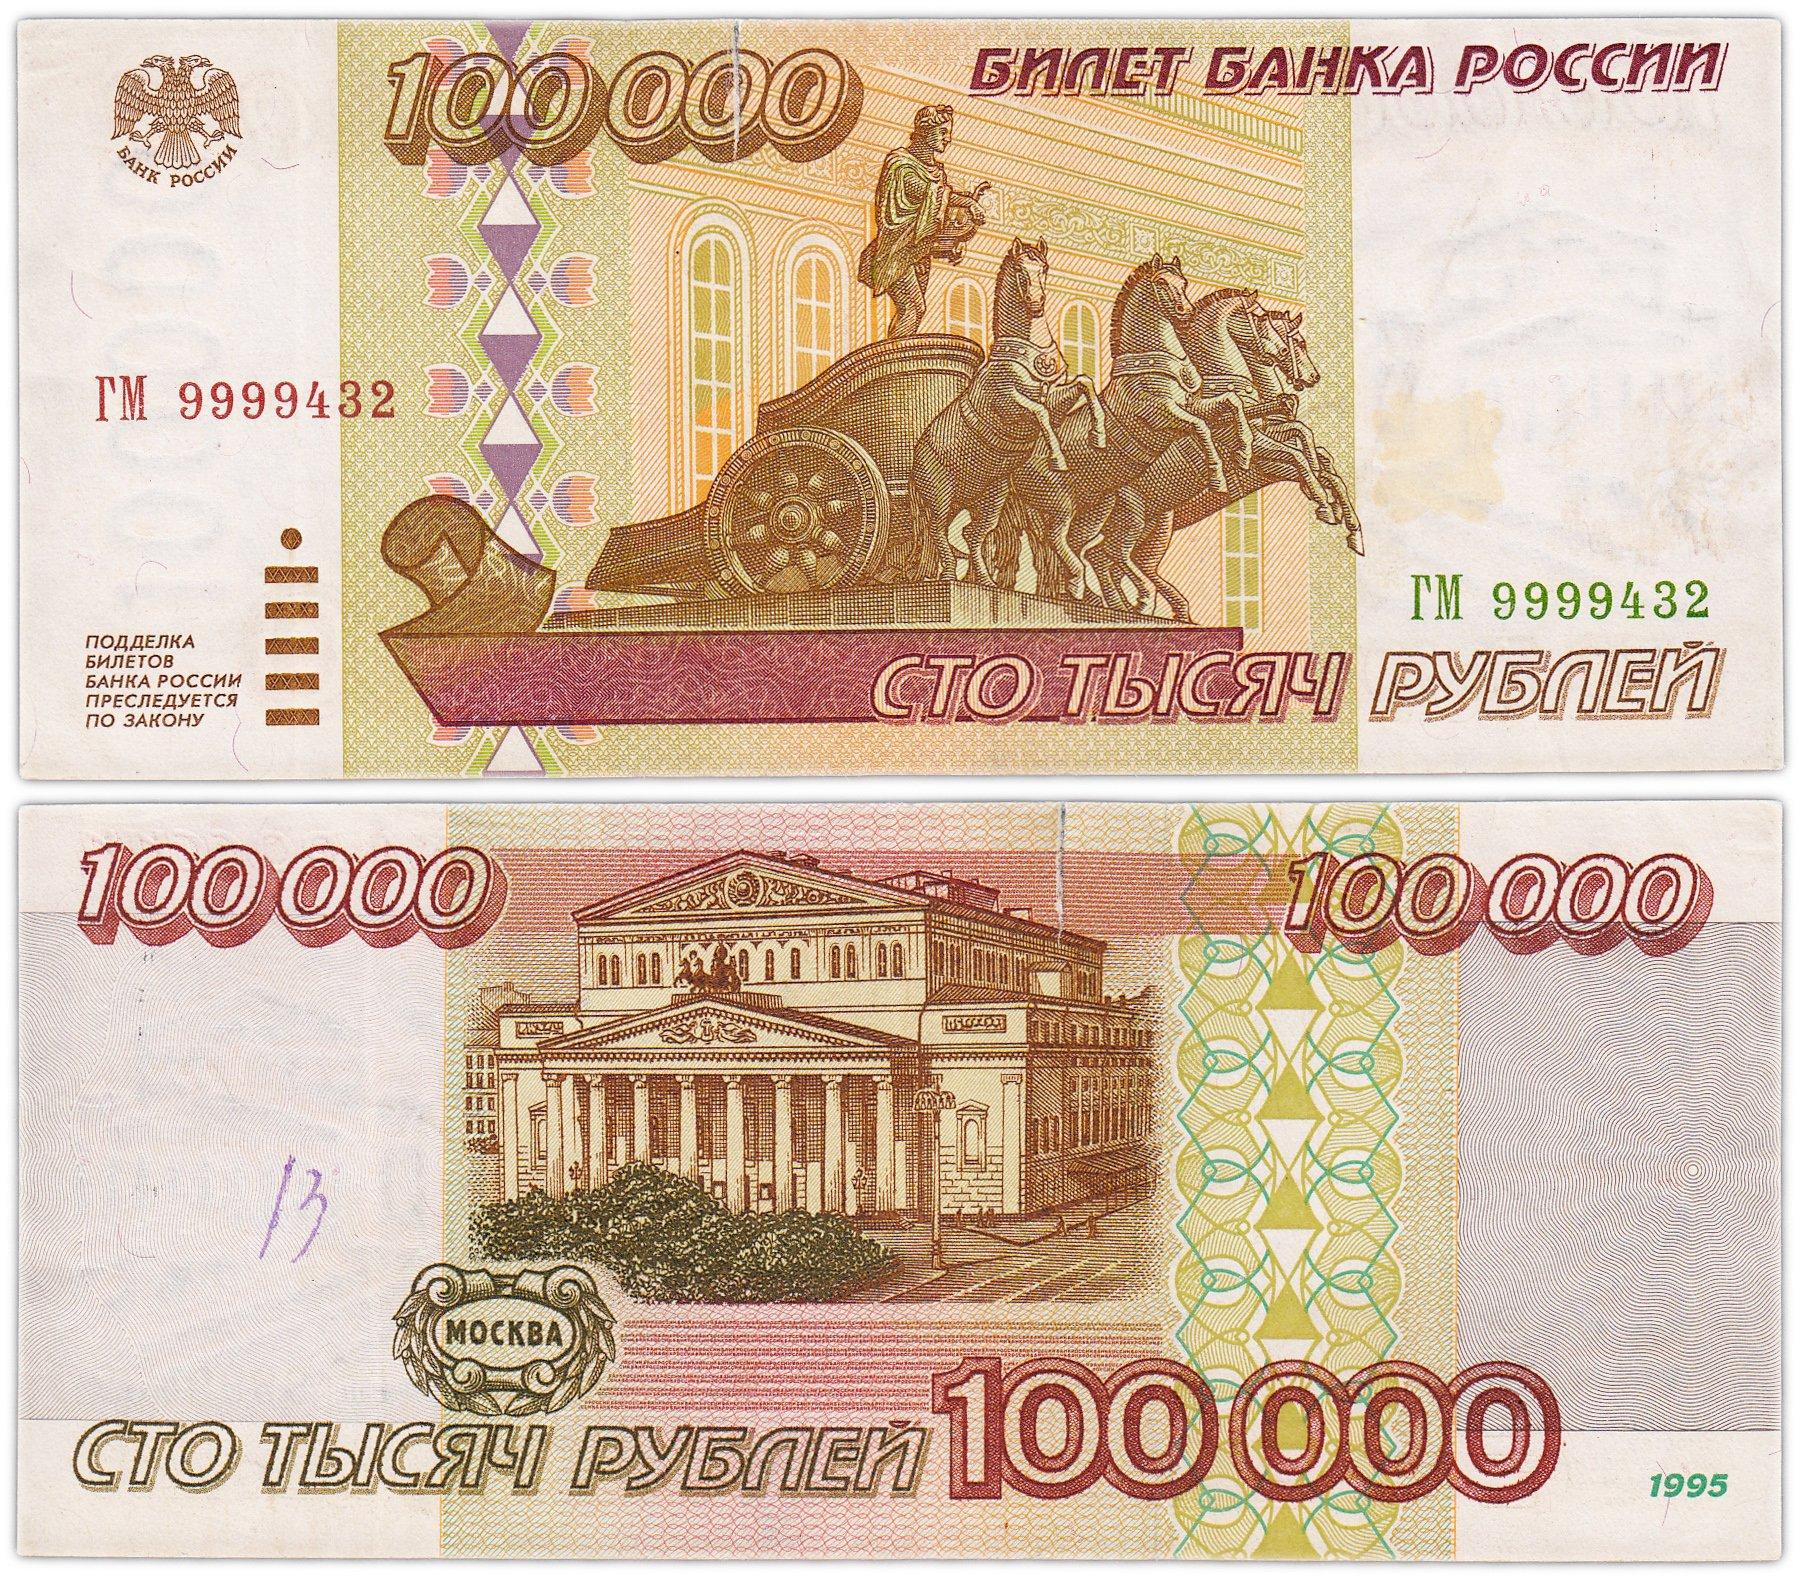 займу 100000 рублей